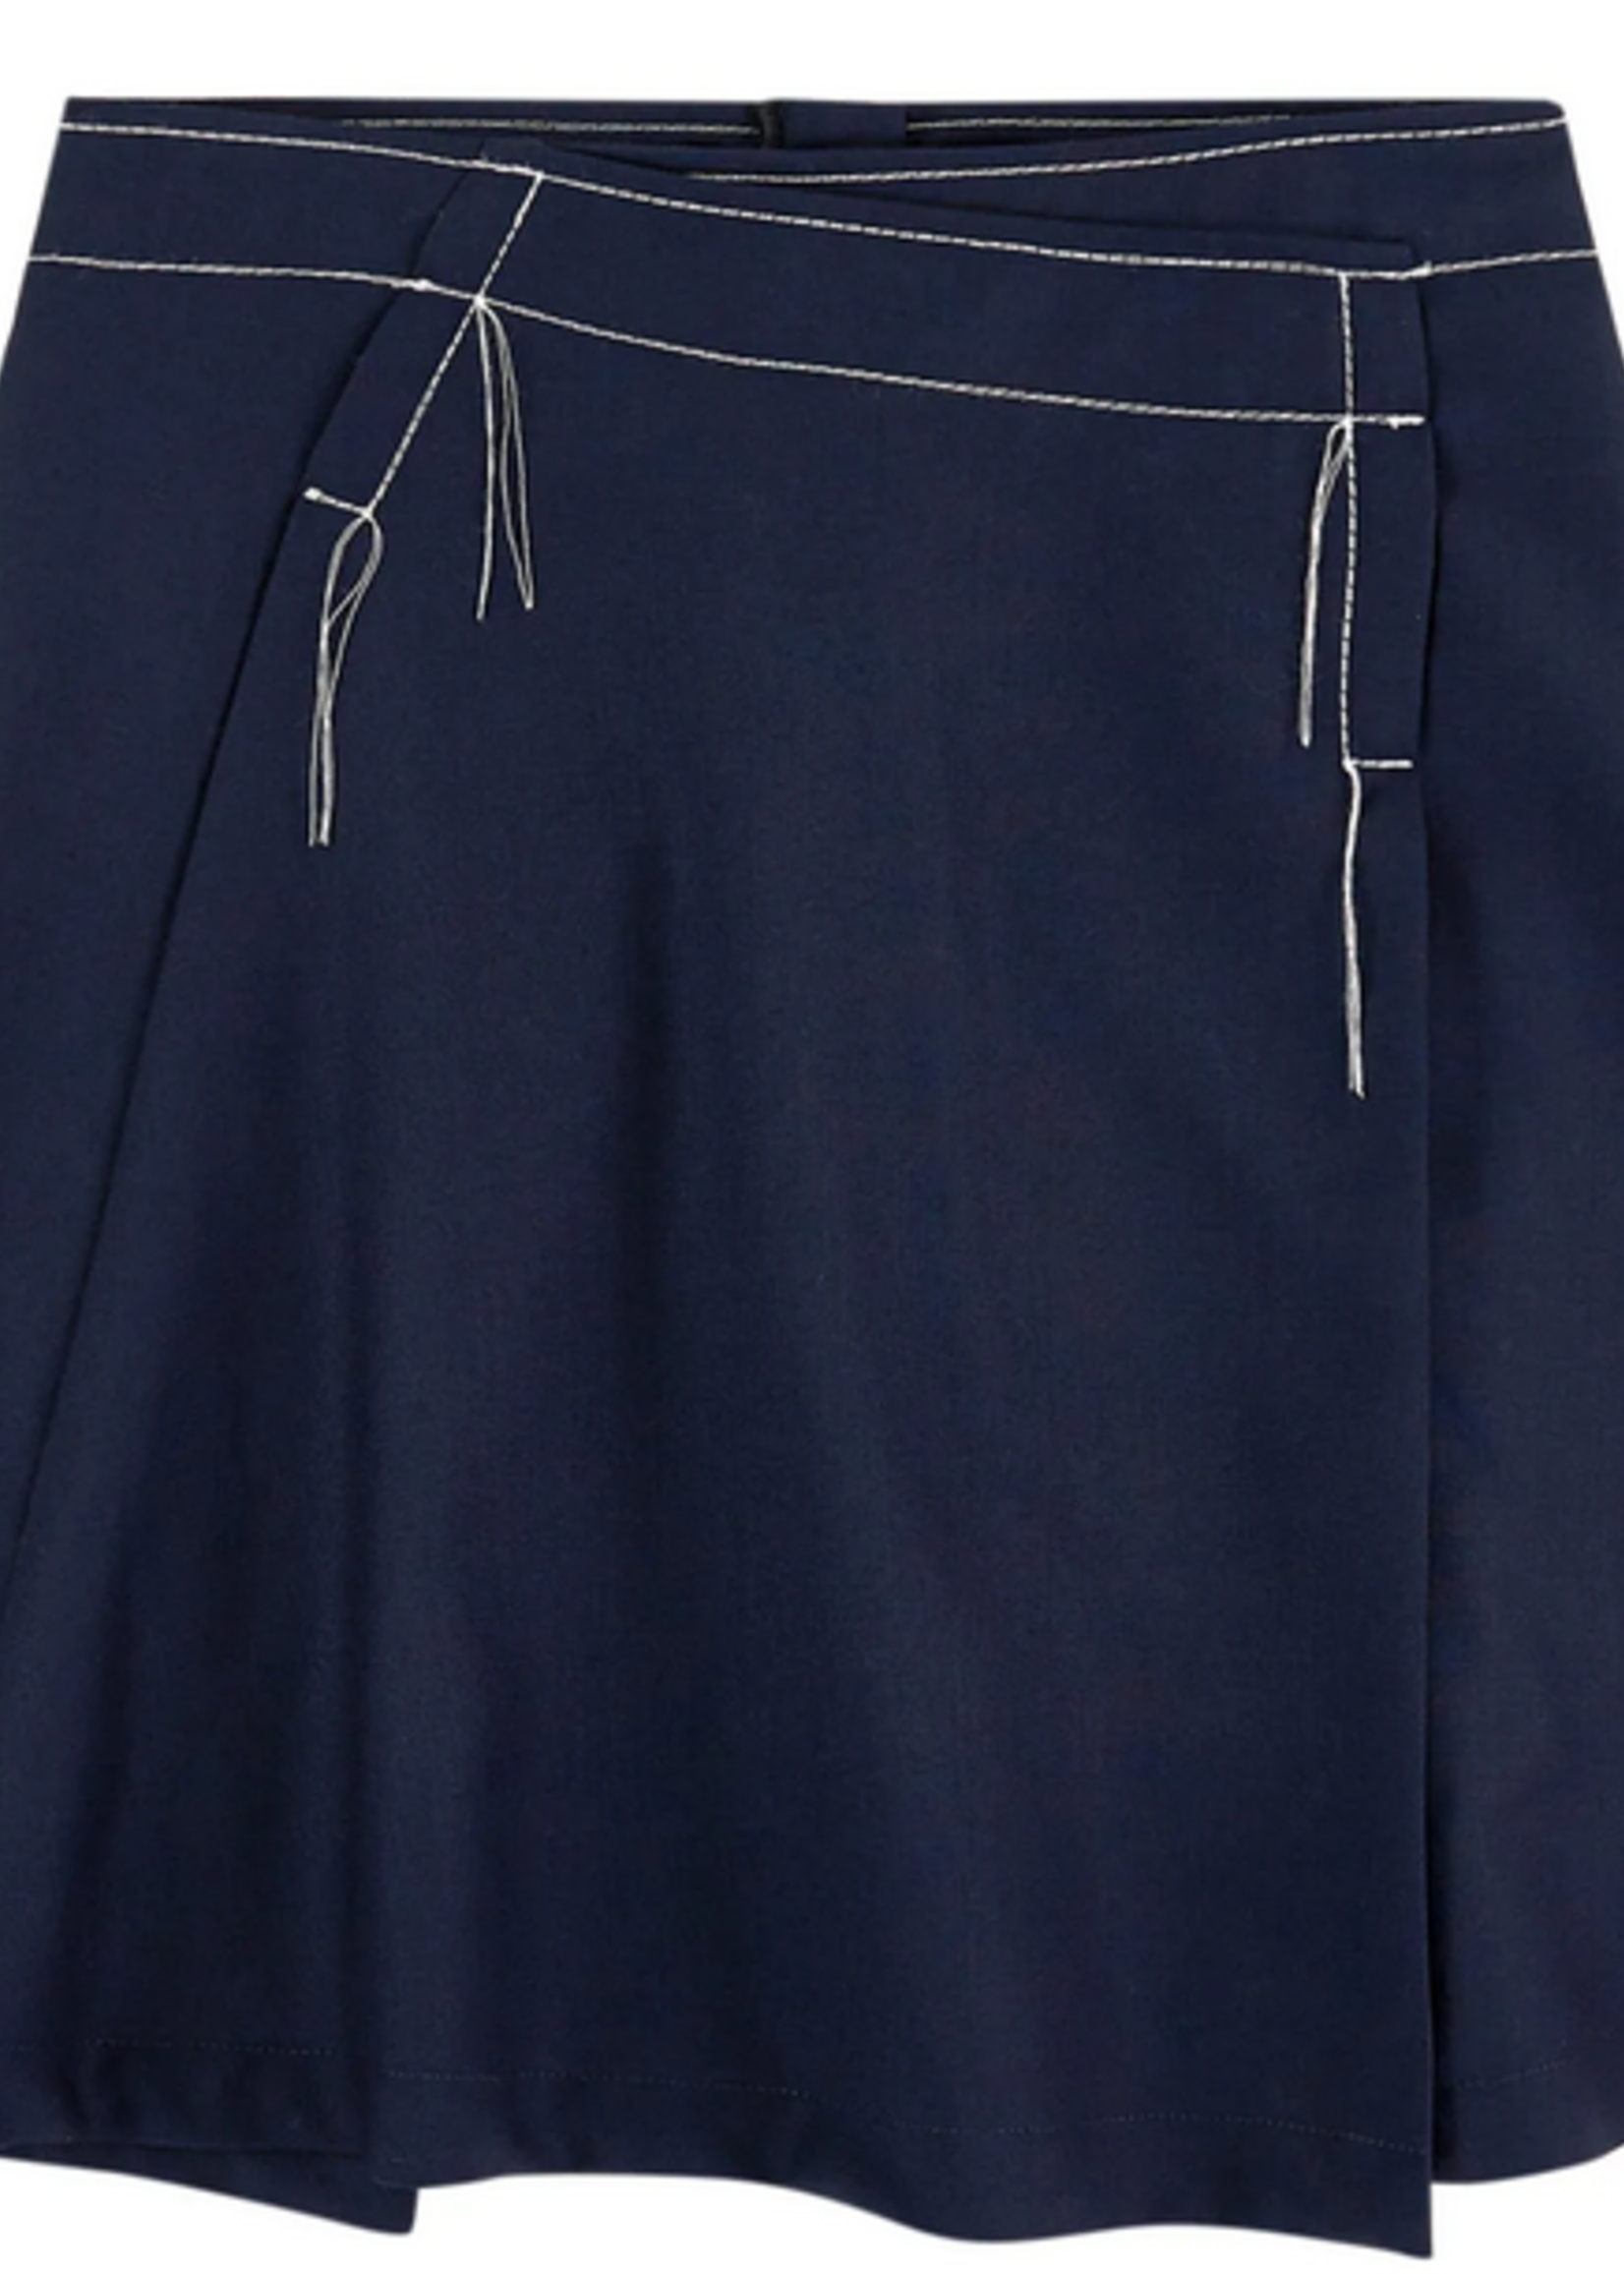 Marni marni Skirt